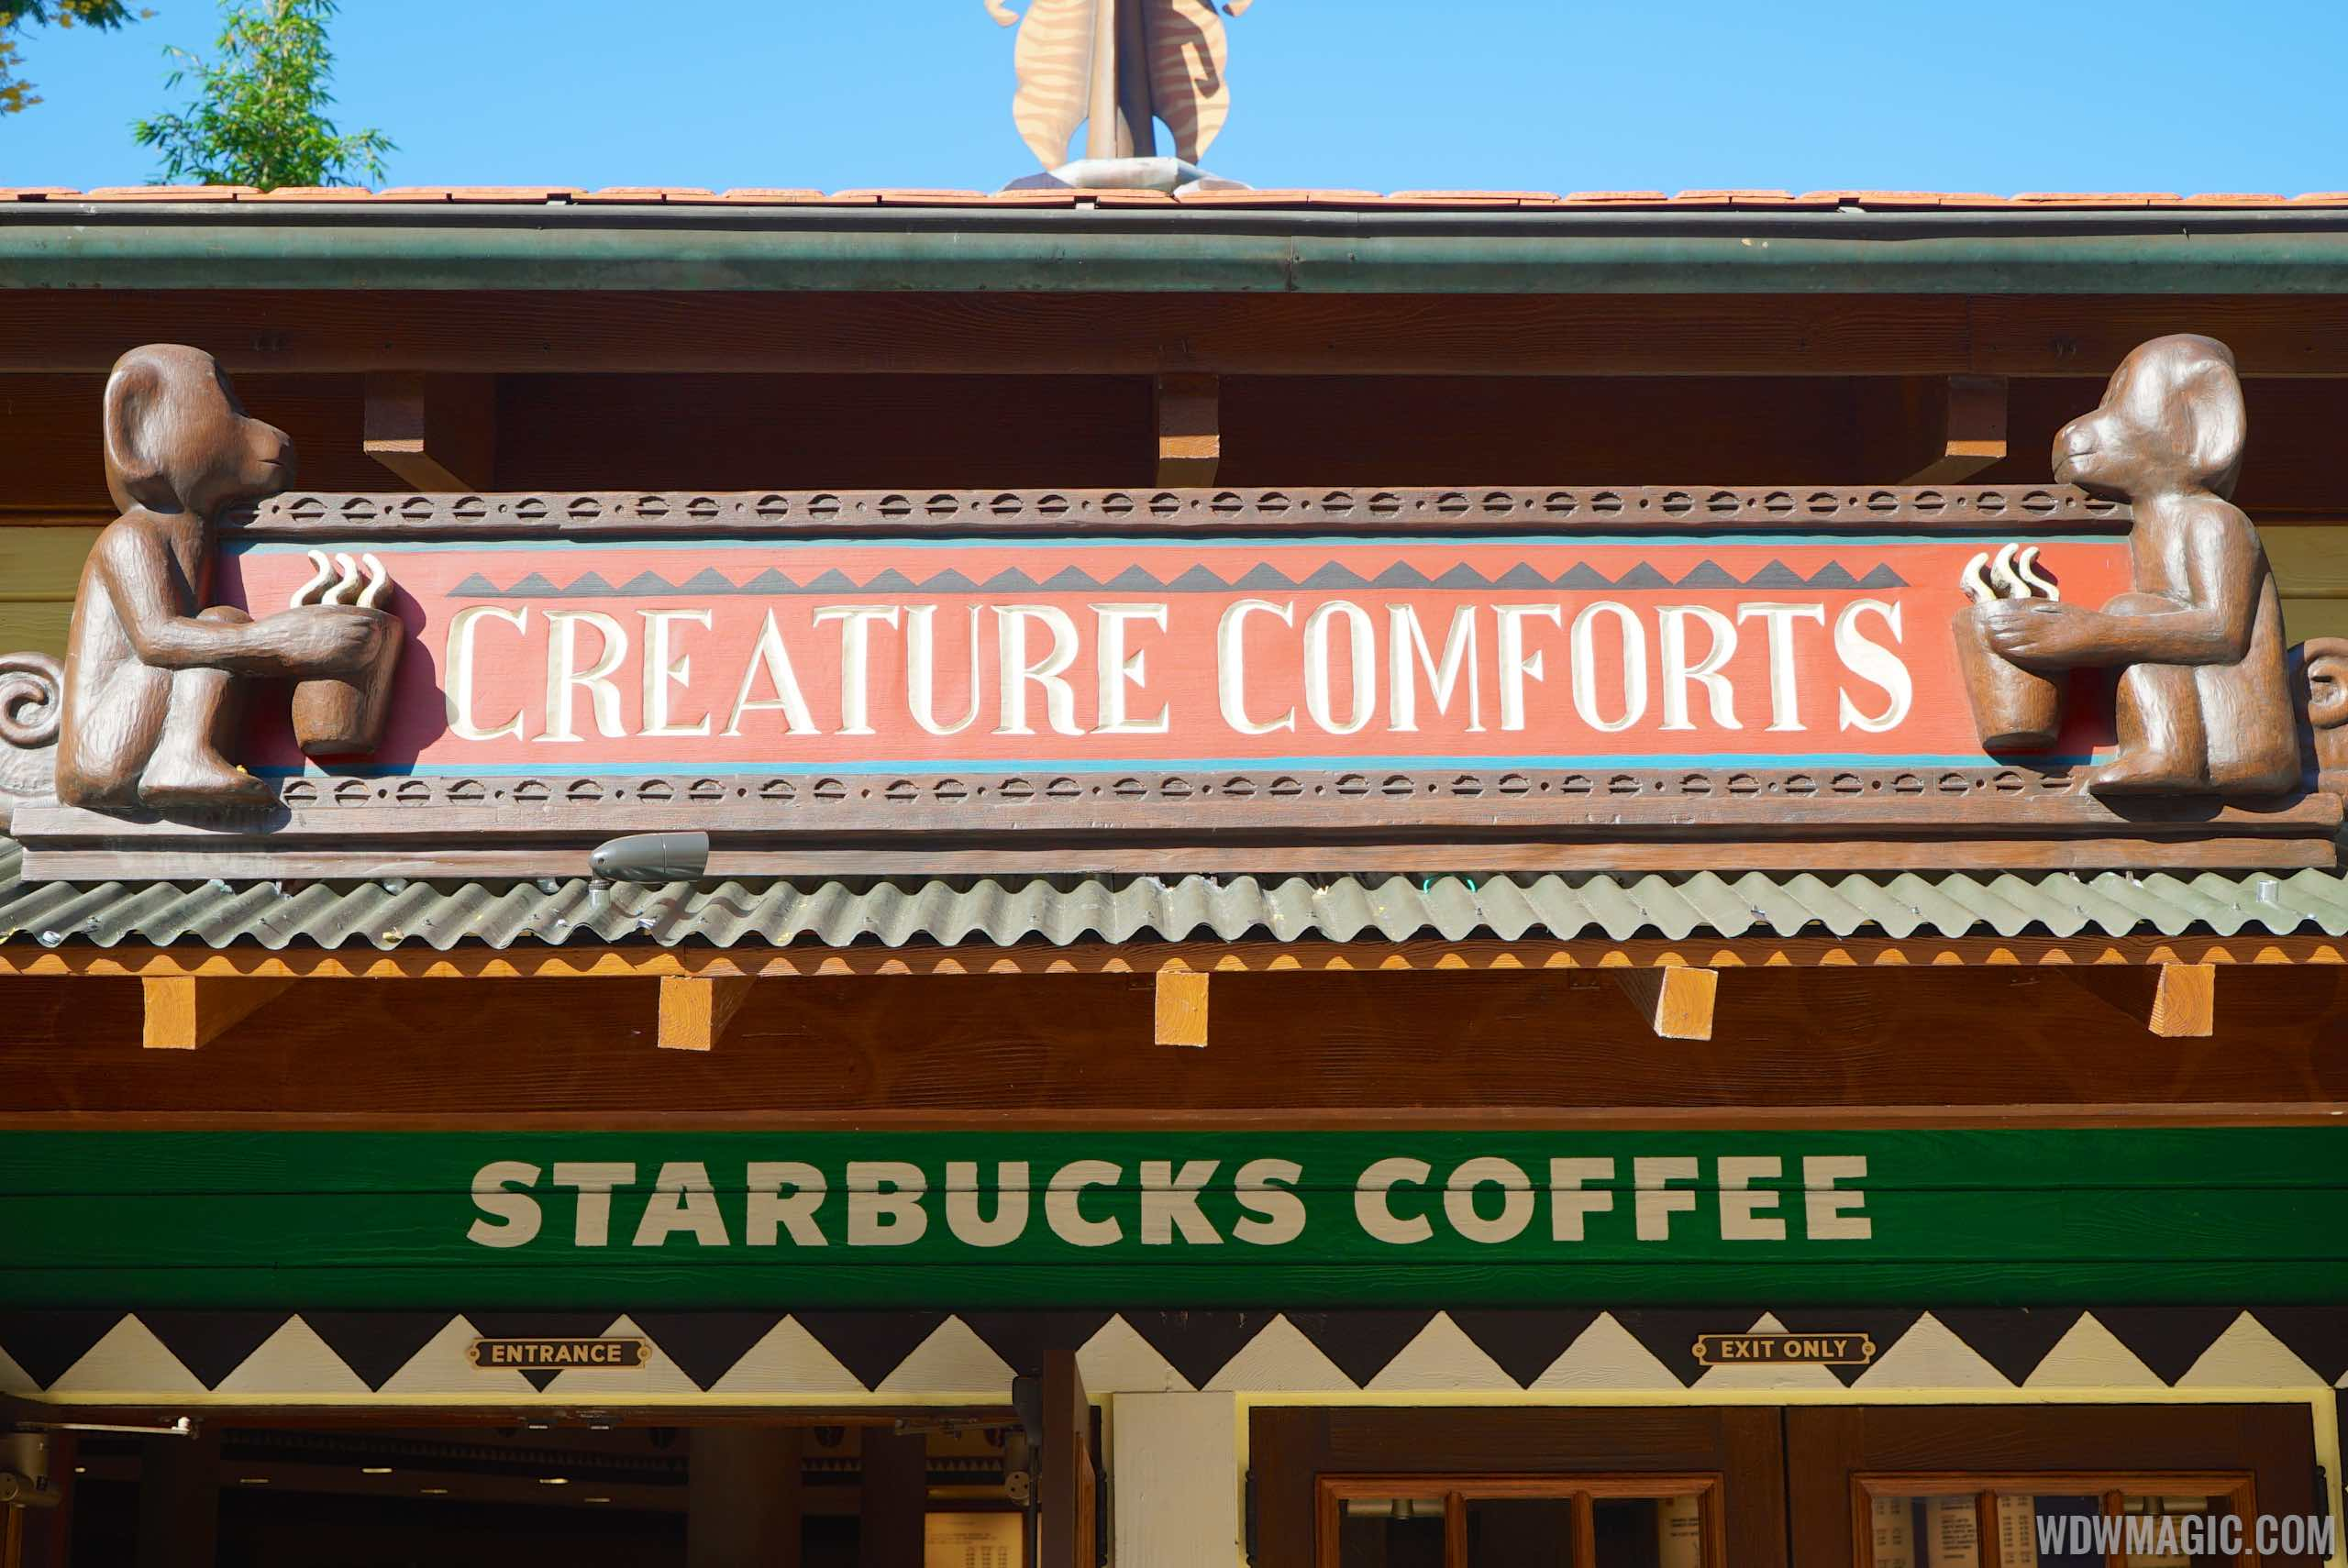 Creature Comforts Starbucks - Signage